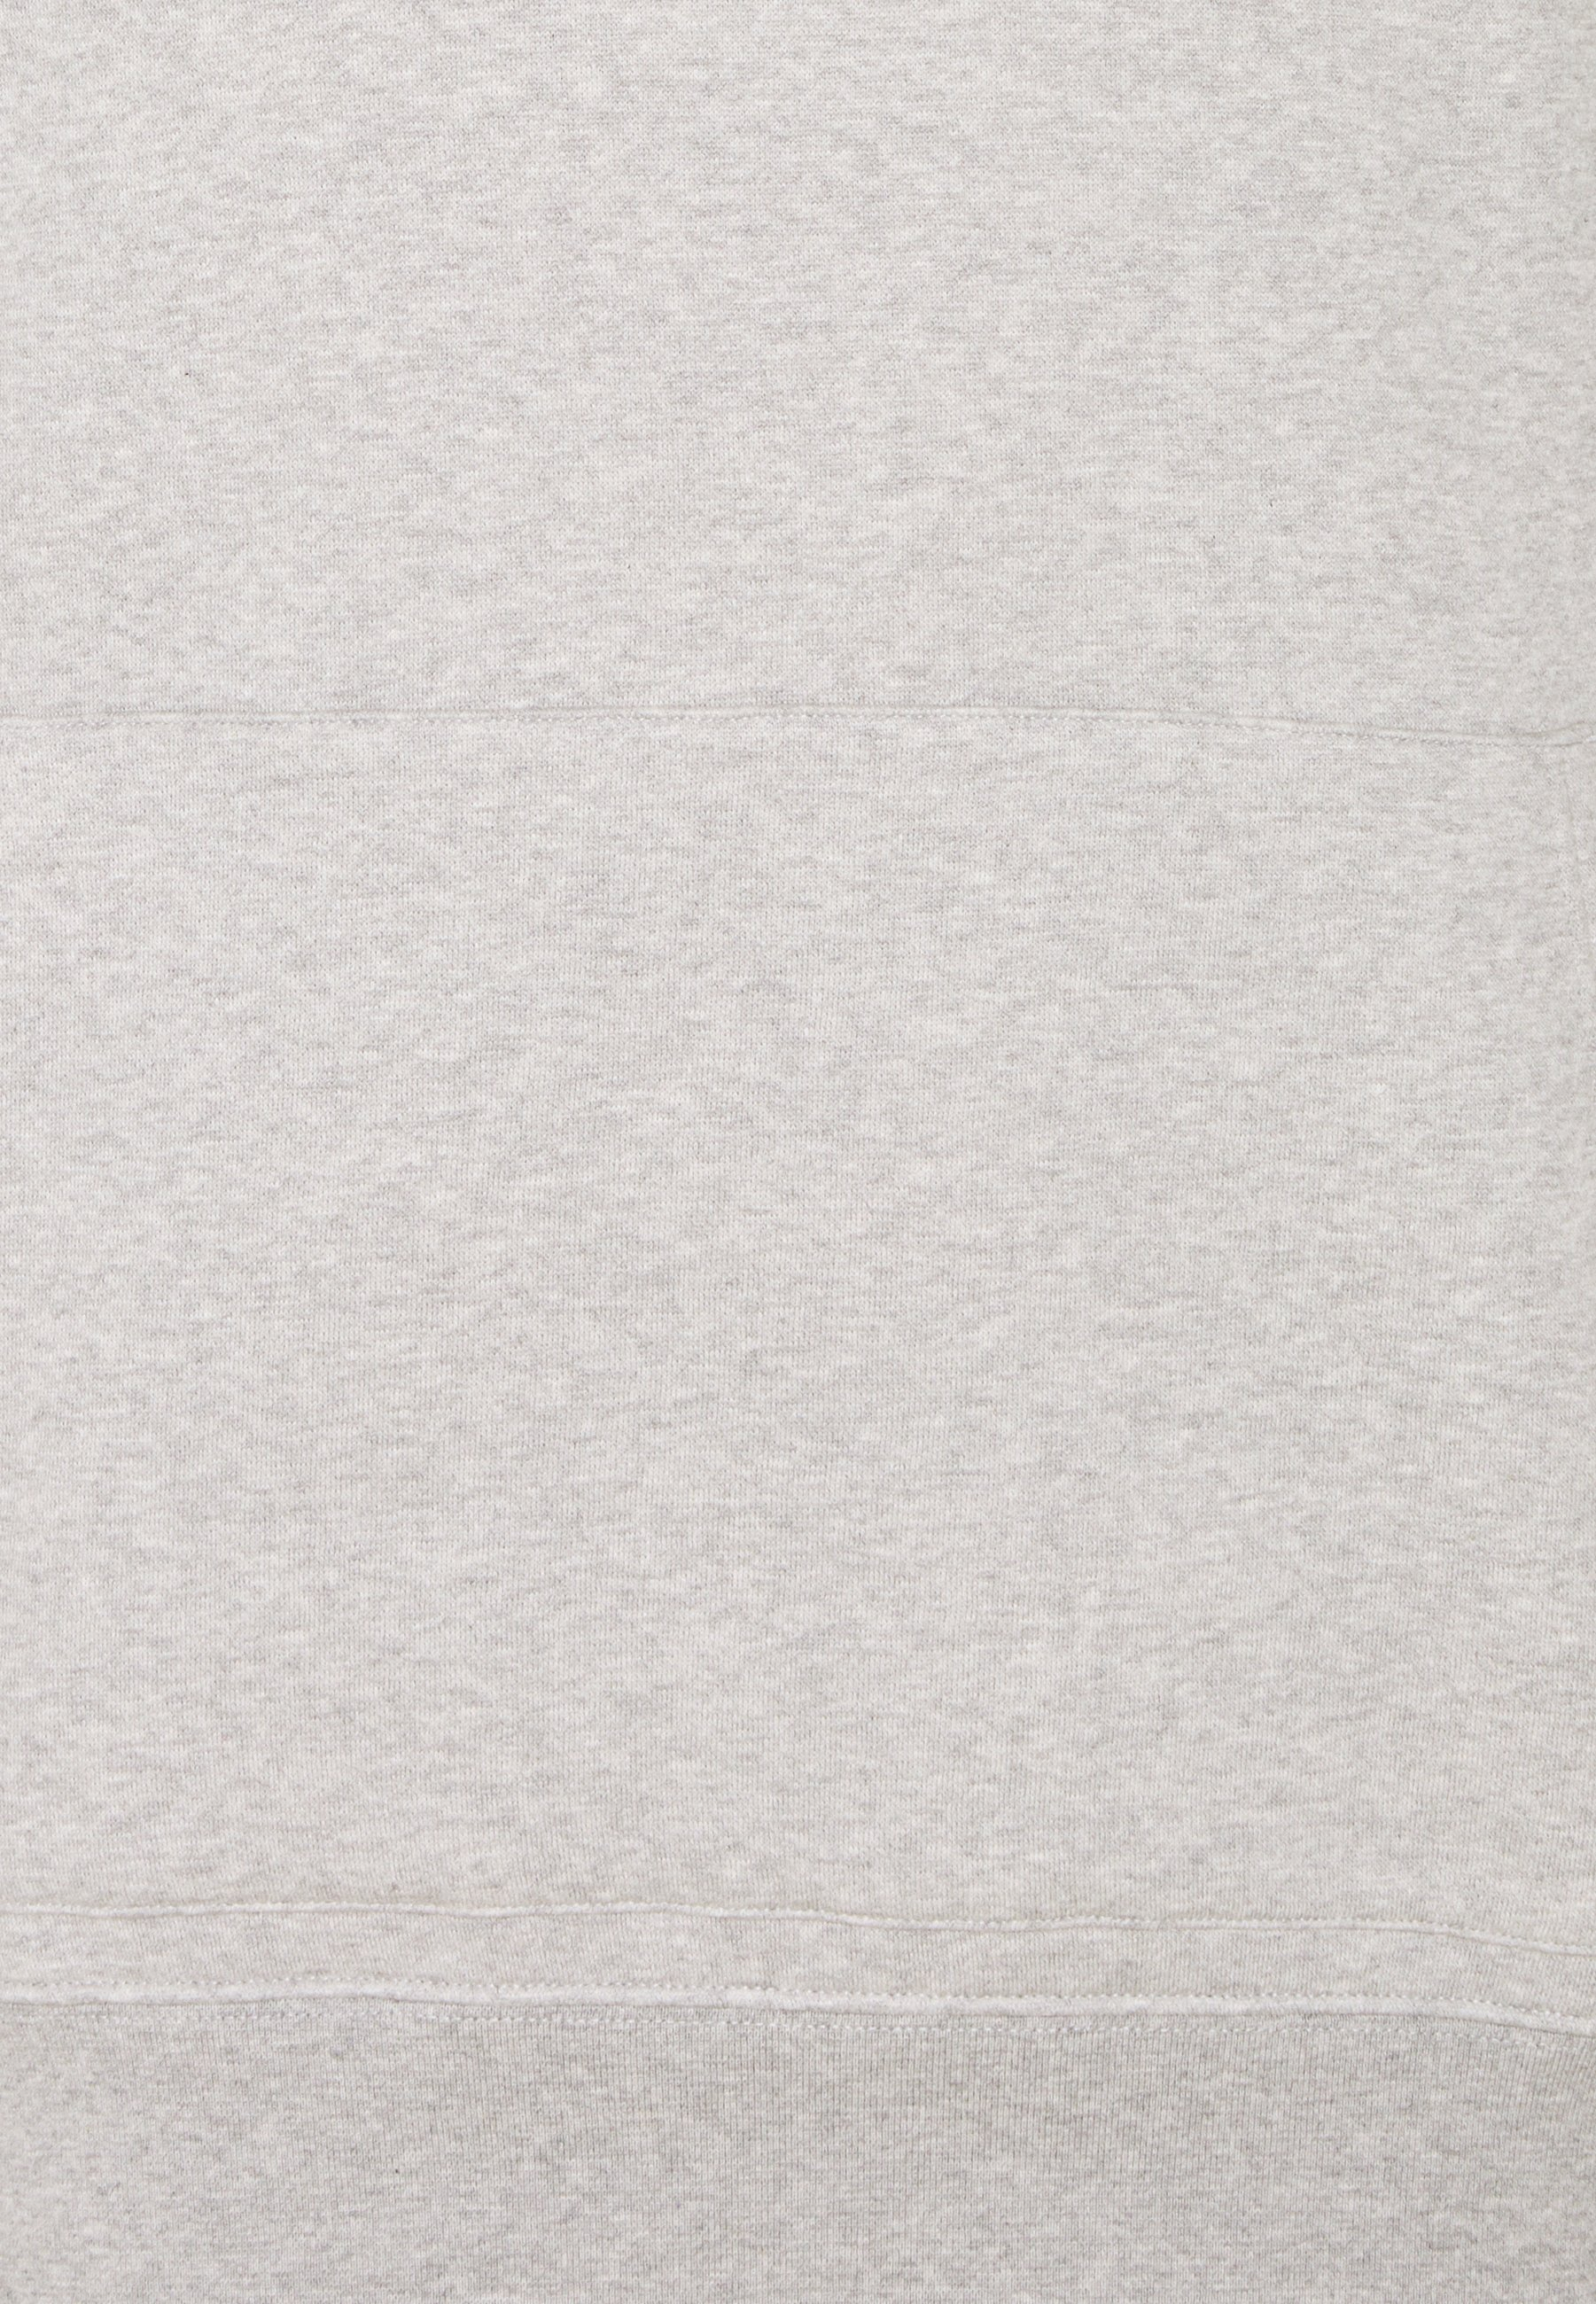 Best Place Men's Clothing J.LINDEBERG CHIP  Hoodie stone grey melange 83TCr0nKU